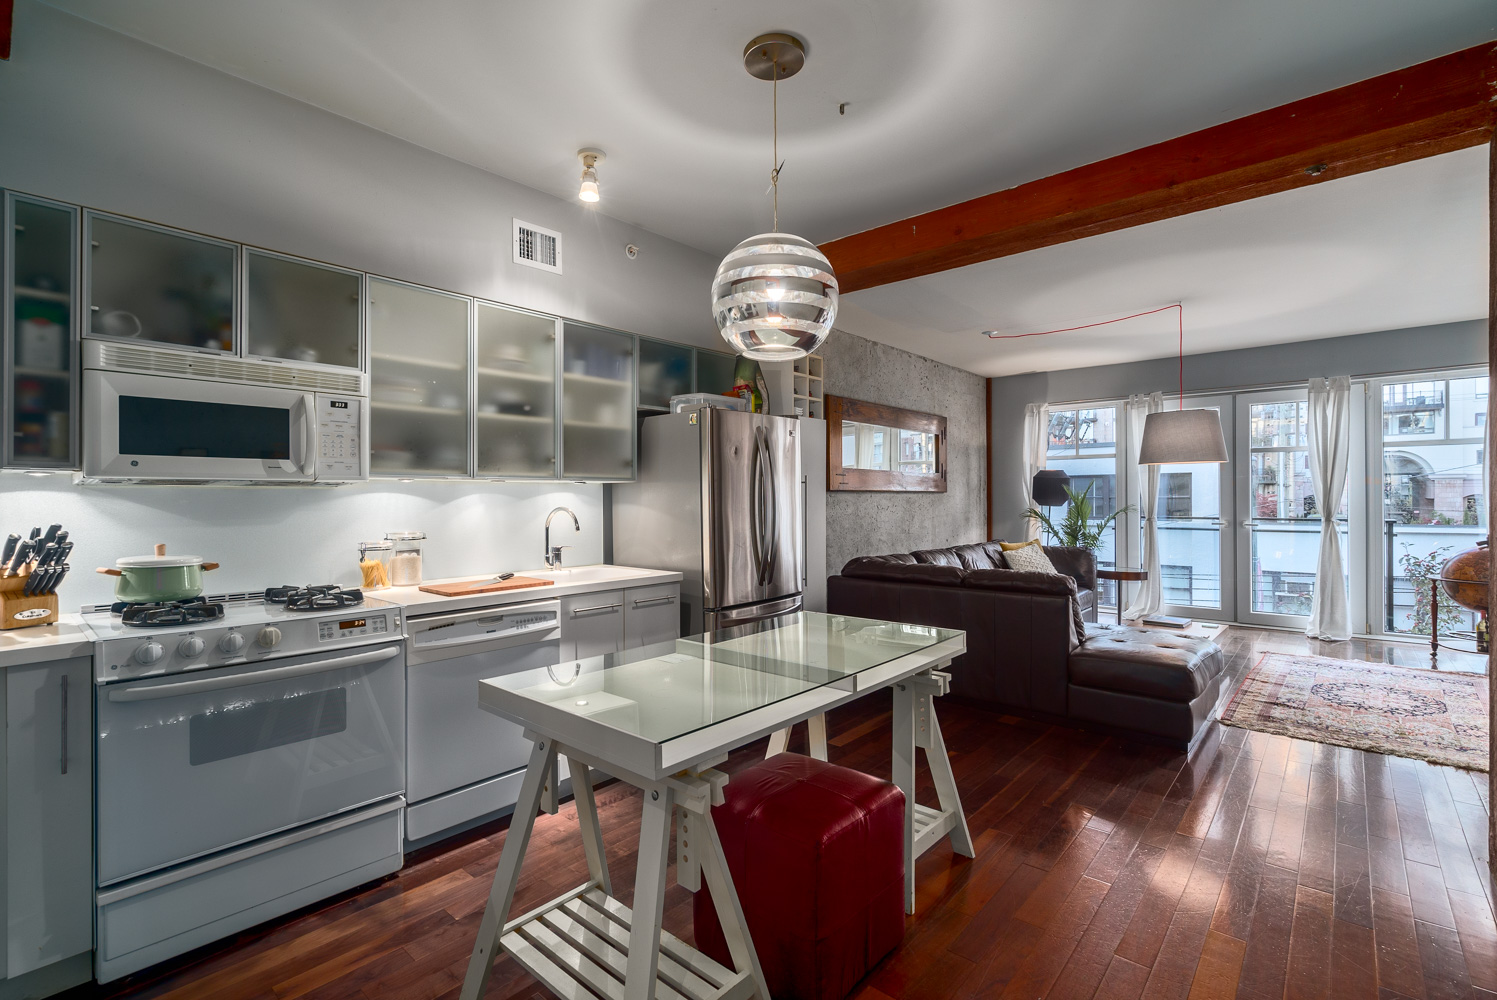 1275 hamilton st loft style condo - Yaletown Vancouver